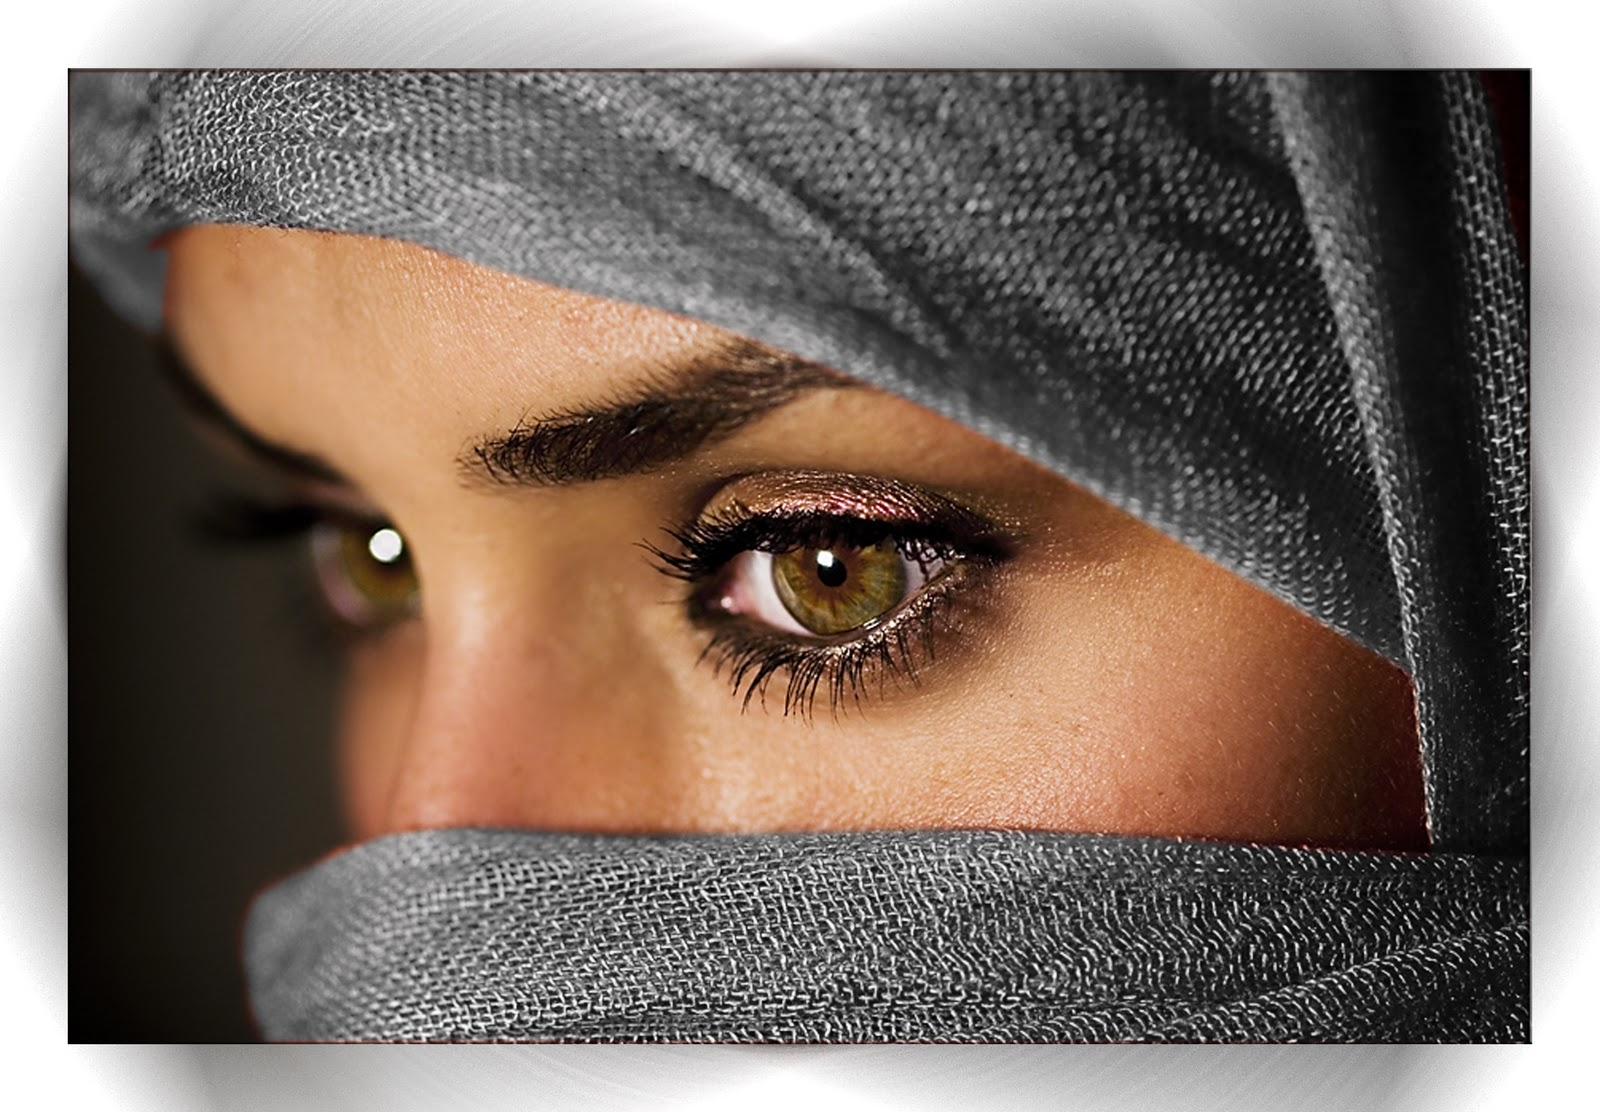 Abang Stalker Nak Tahu Pasal Wanita Arab Reminiscence